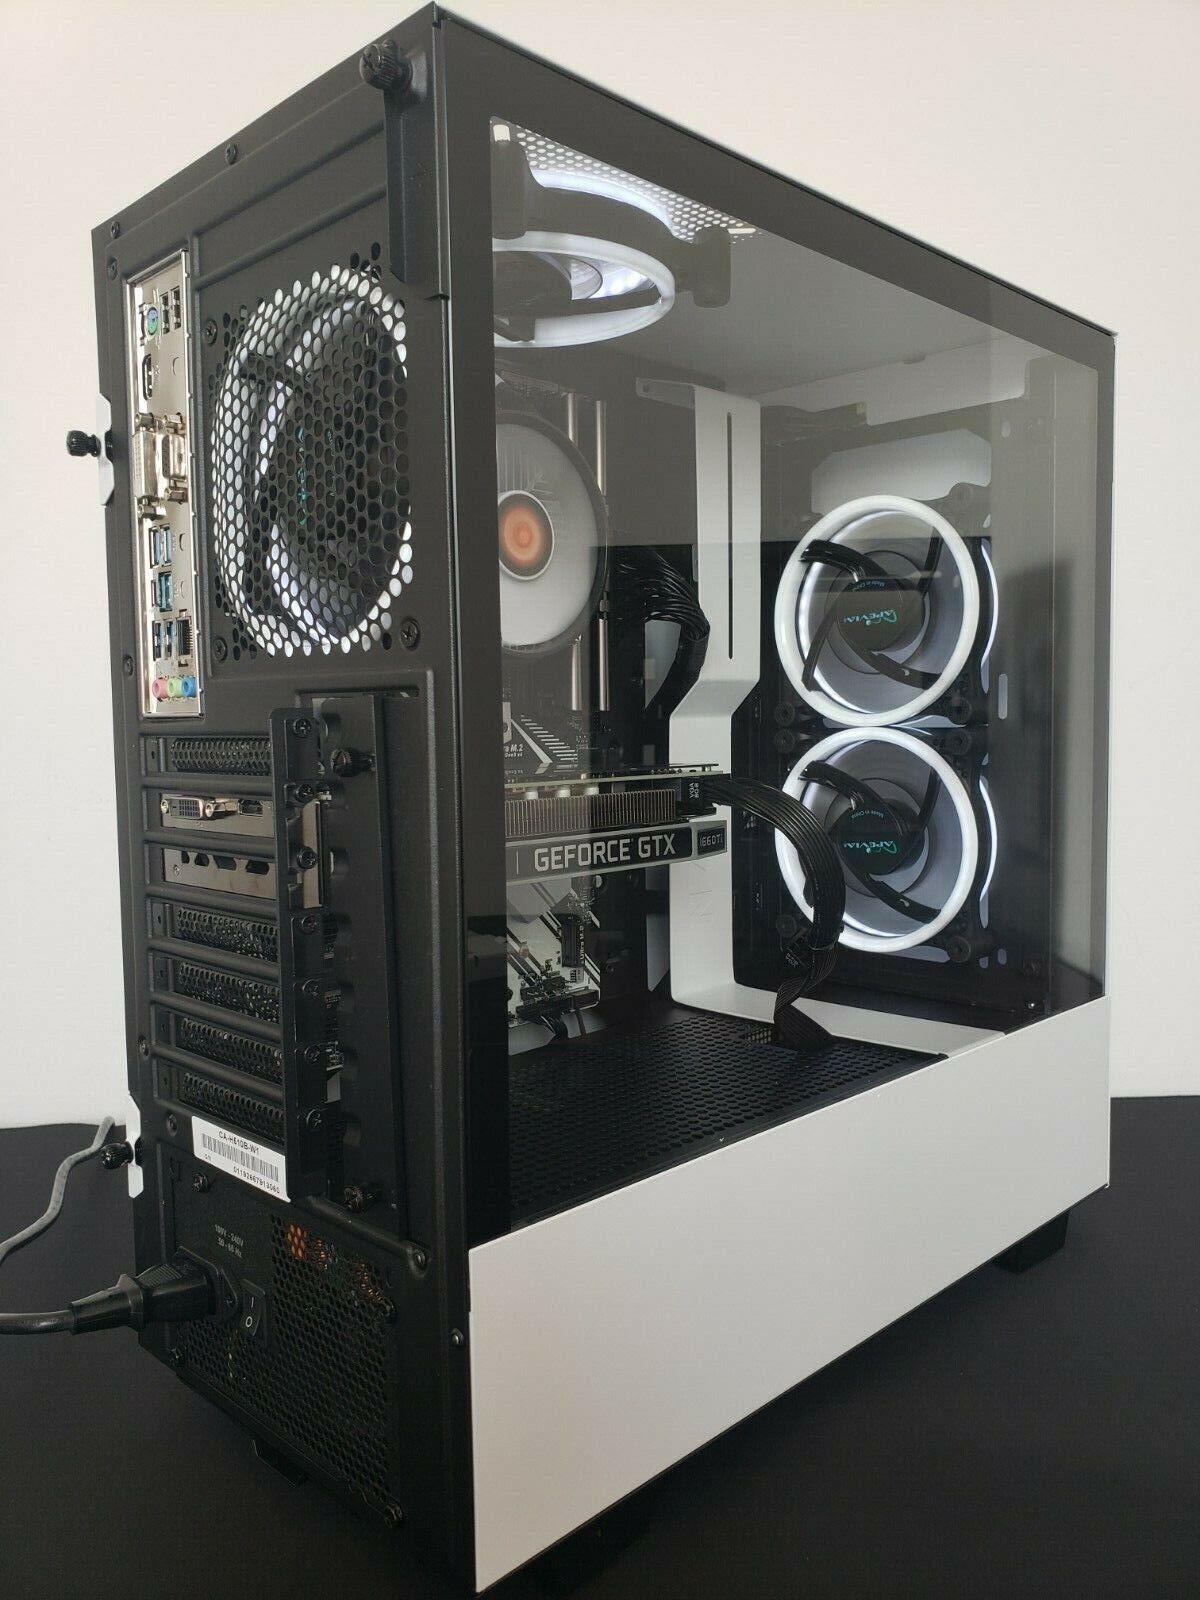 GAMING PC i7 9700K - RTX 2080 8GB - 16GB RAM - 512GB SSD - 1